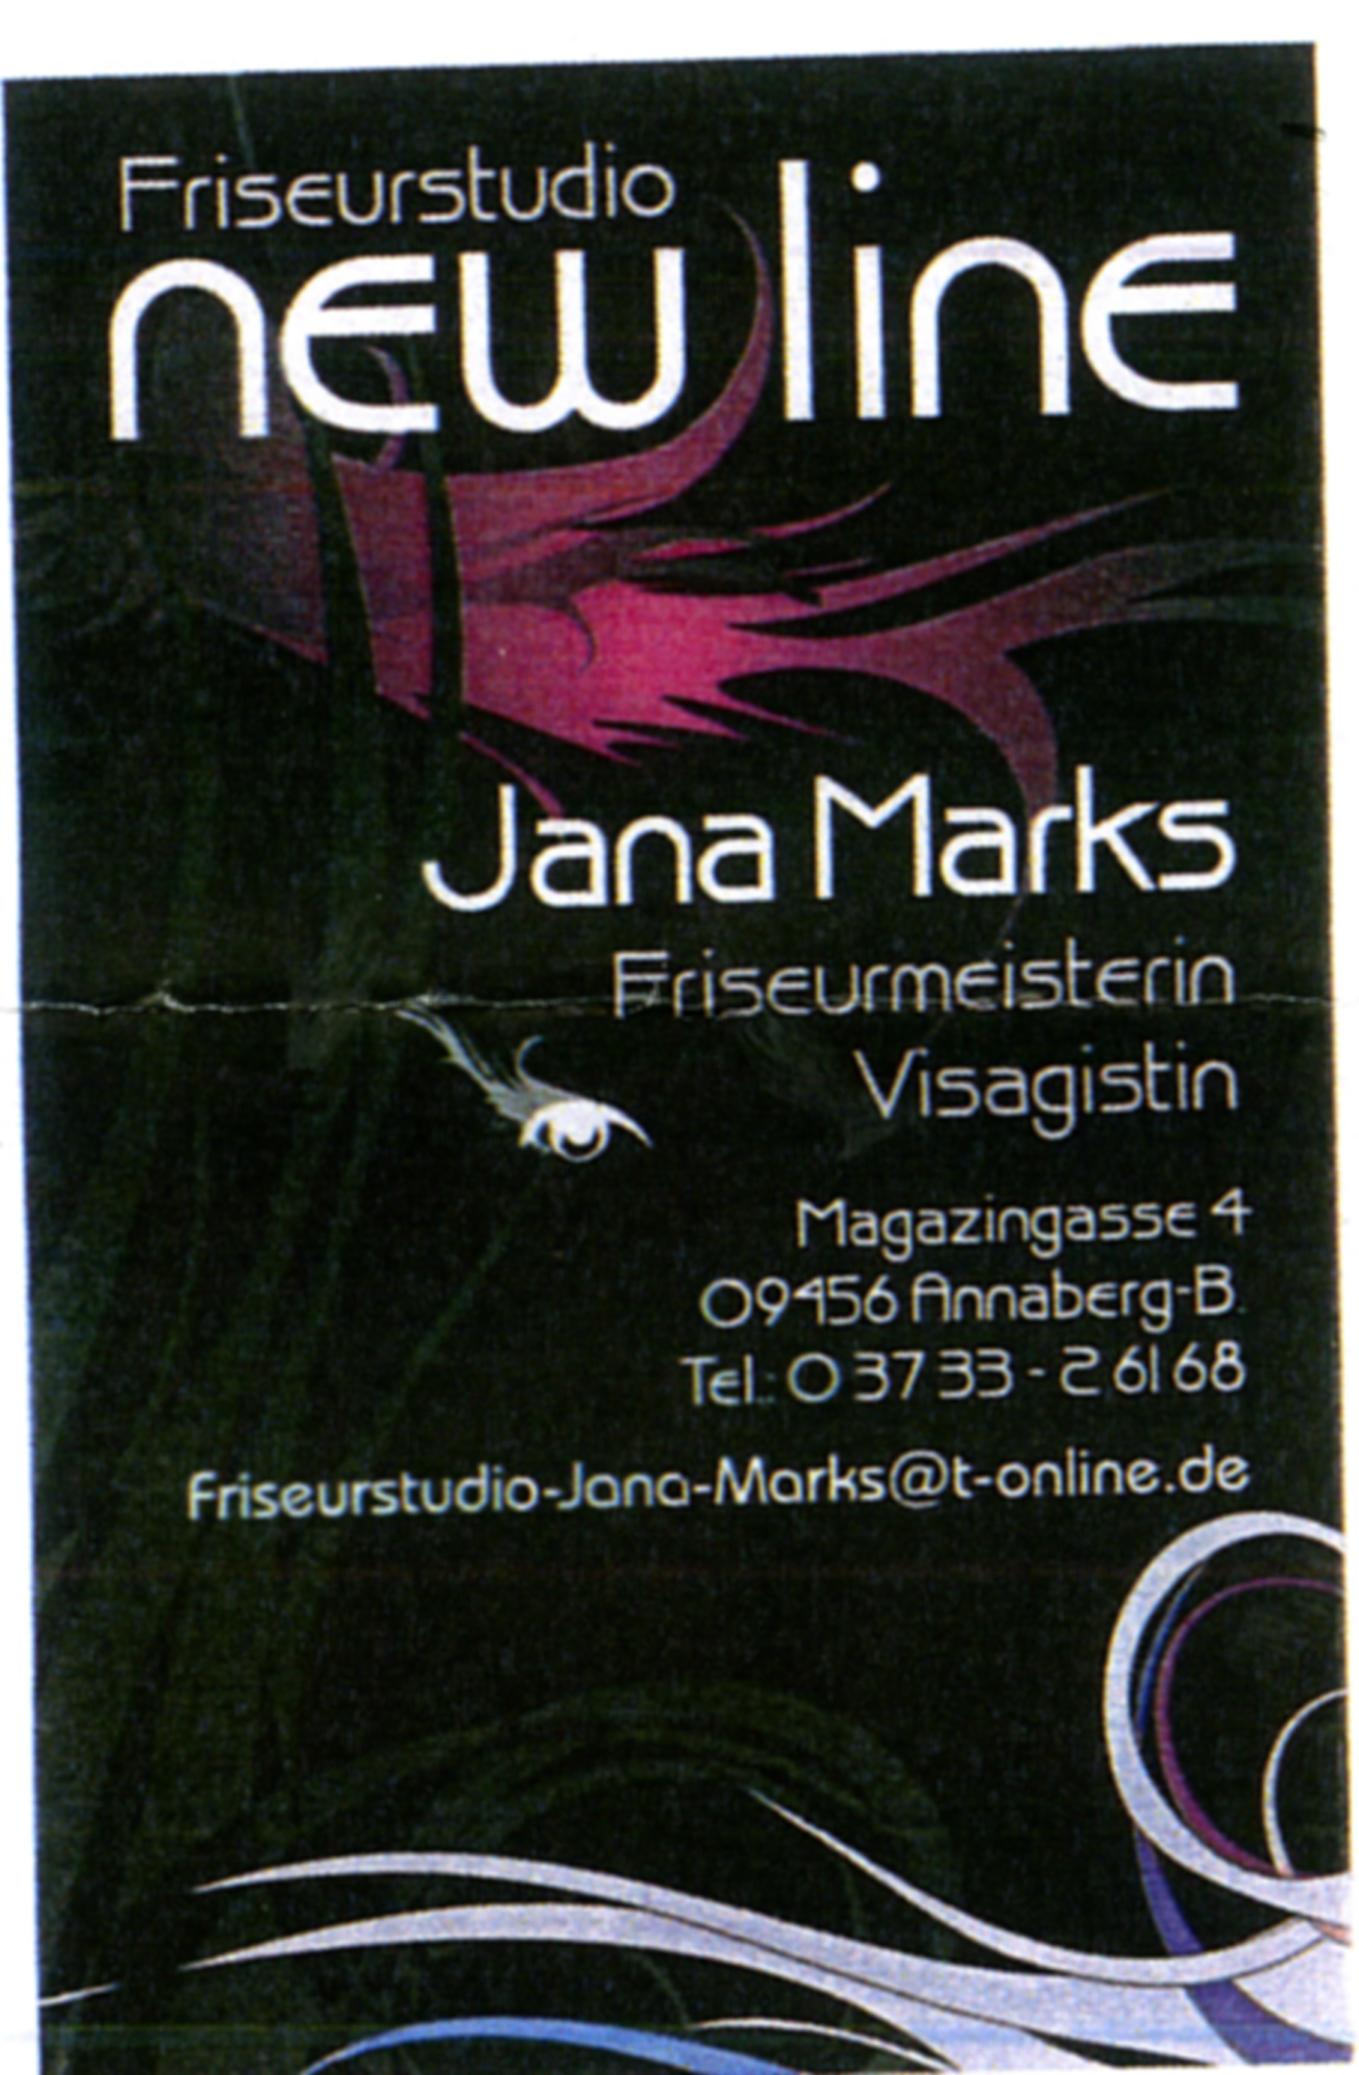 Bild der Friseurstudio new line Jana Marks